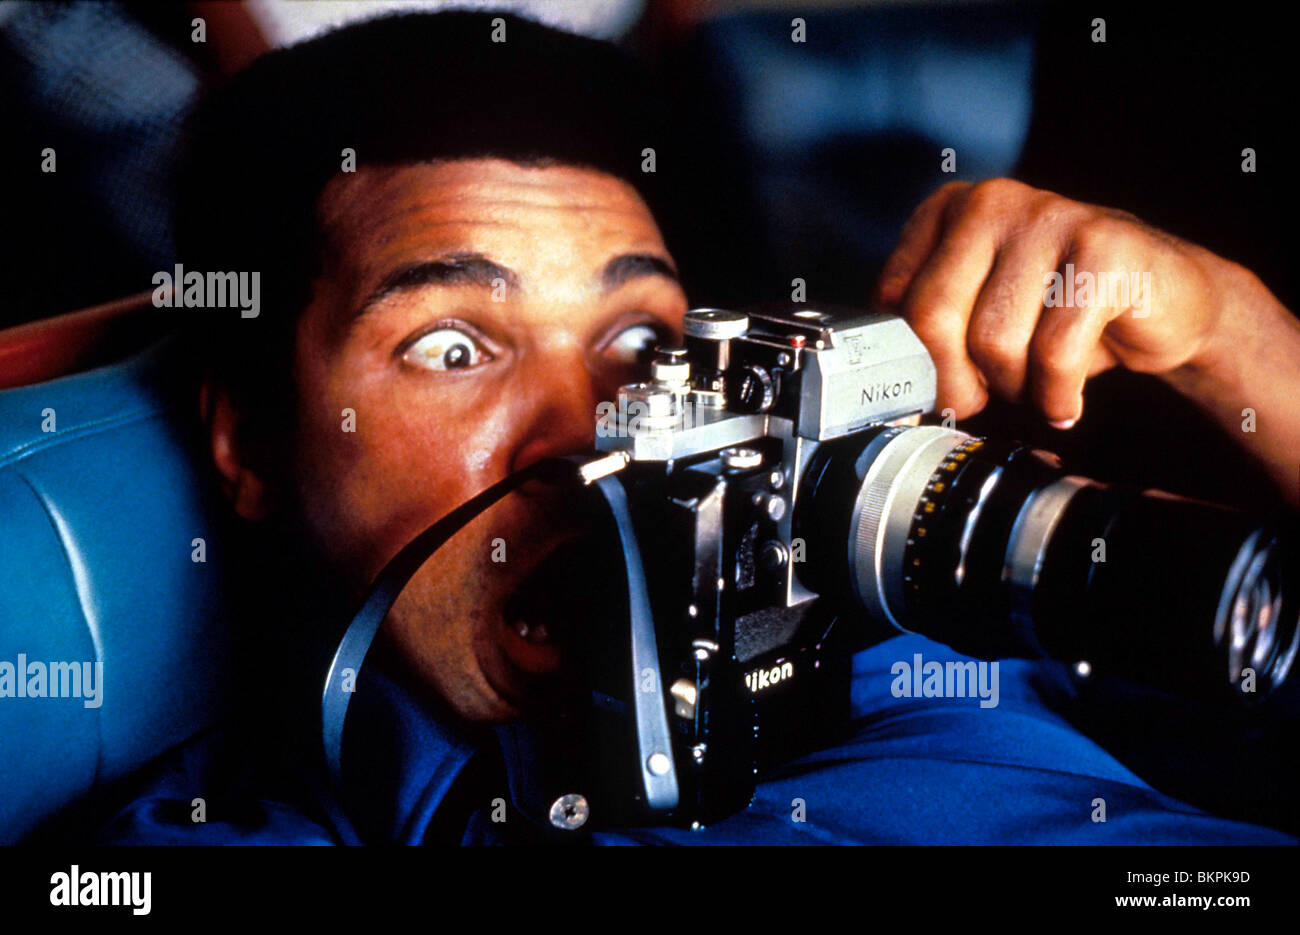 WHEN WE WERE KINGS (1997) MUHAMMAD ALI WWWK 001 - Stock Image